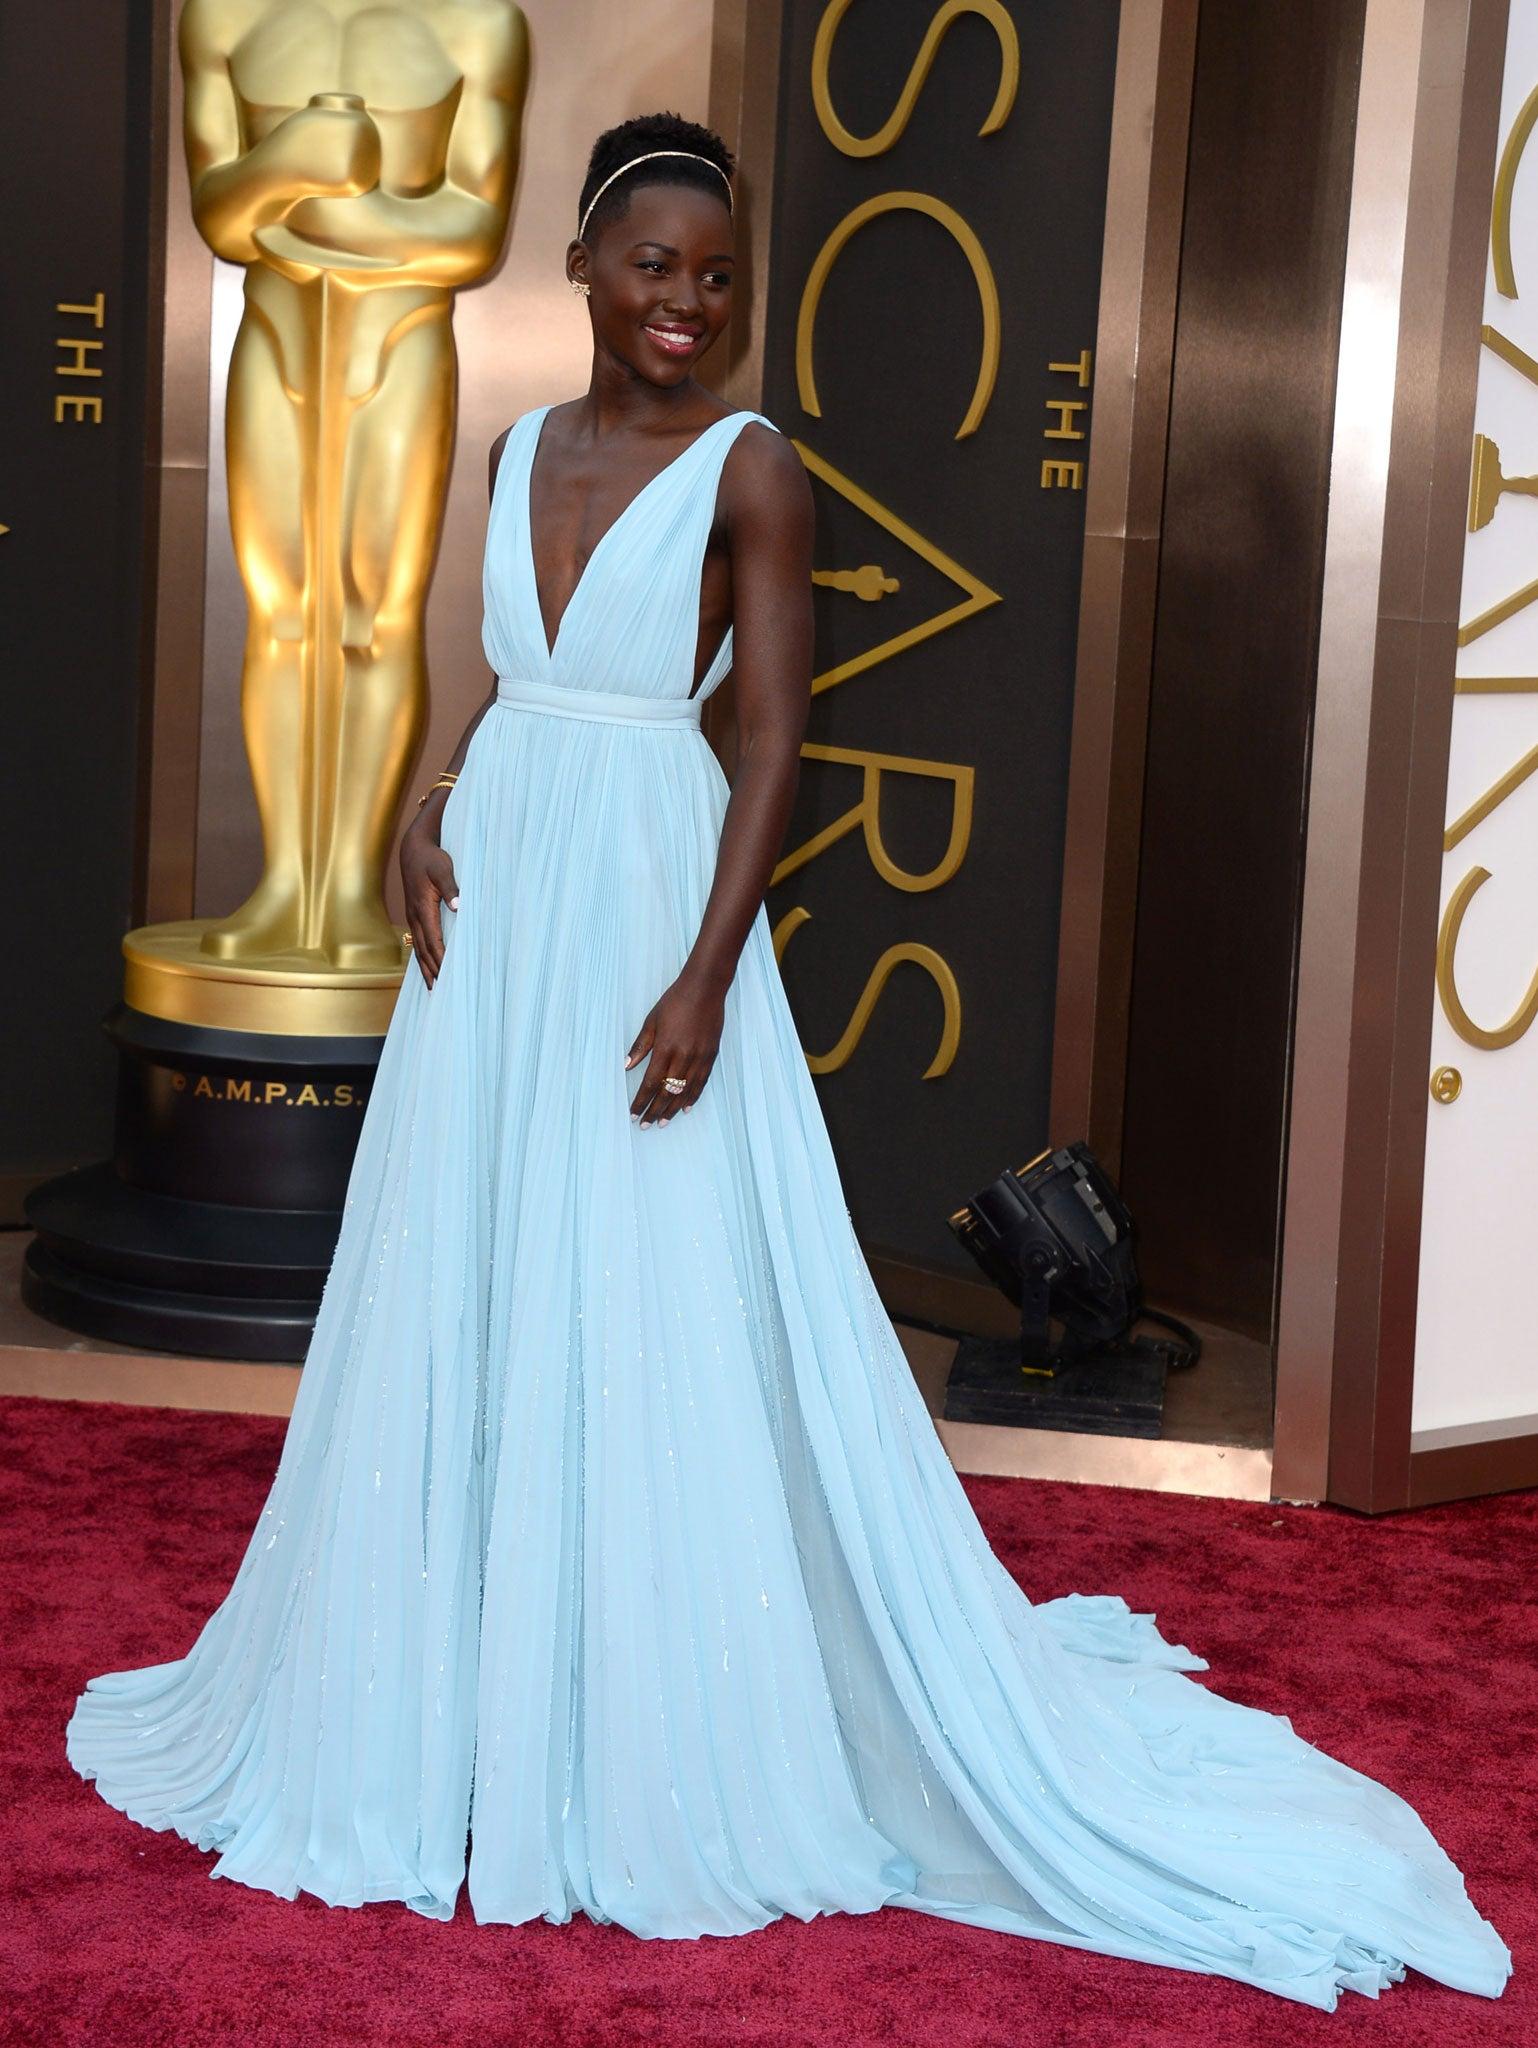 Oscars 2014 Best Supporting Actress Lupita Nyong O